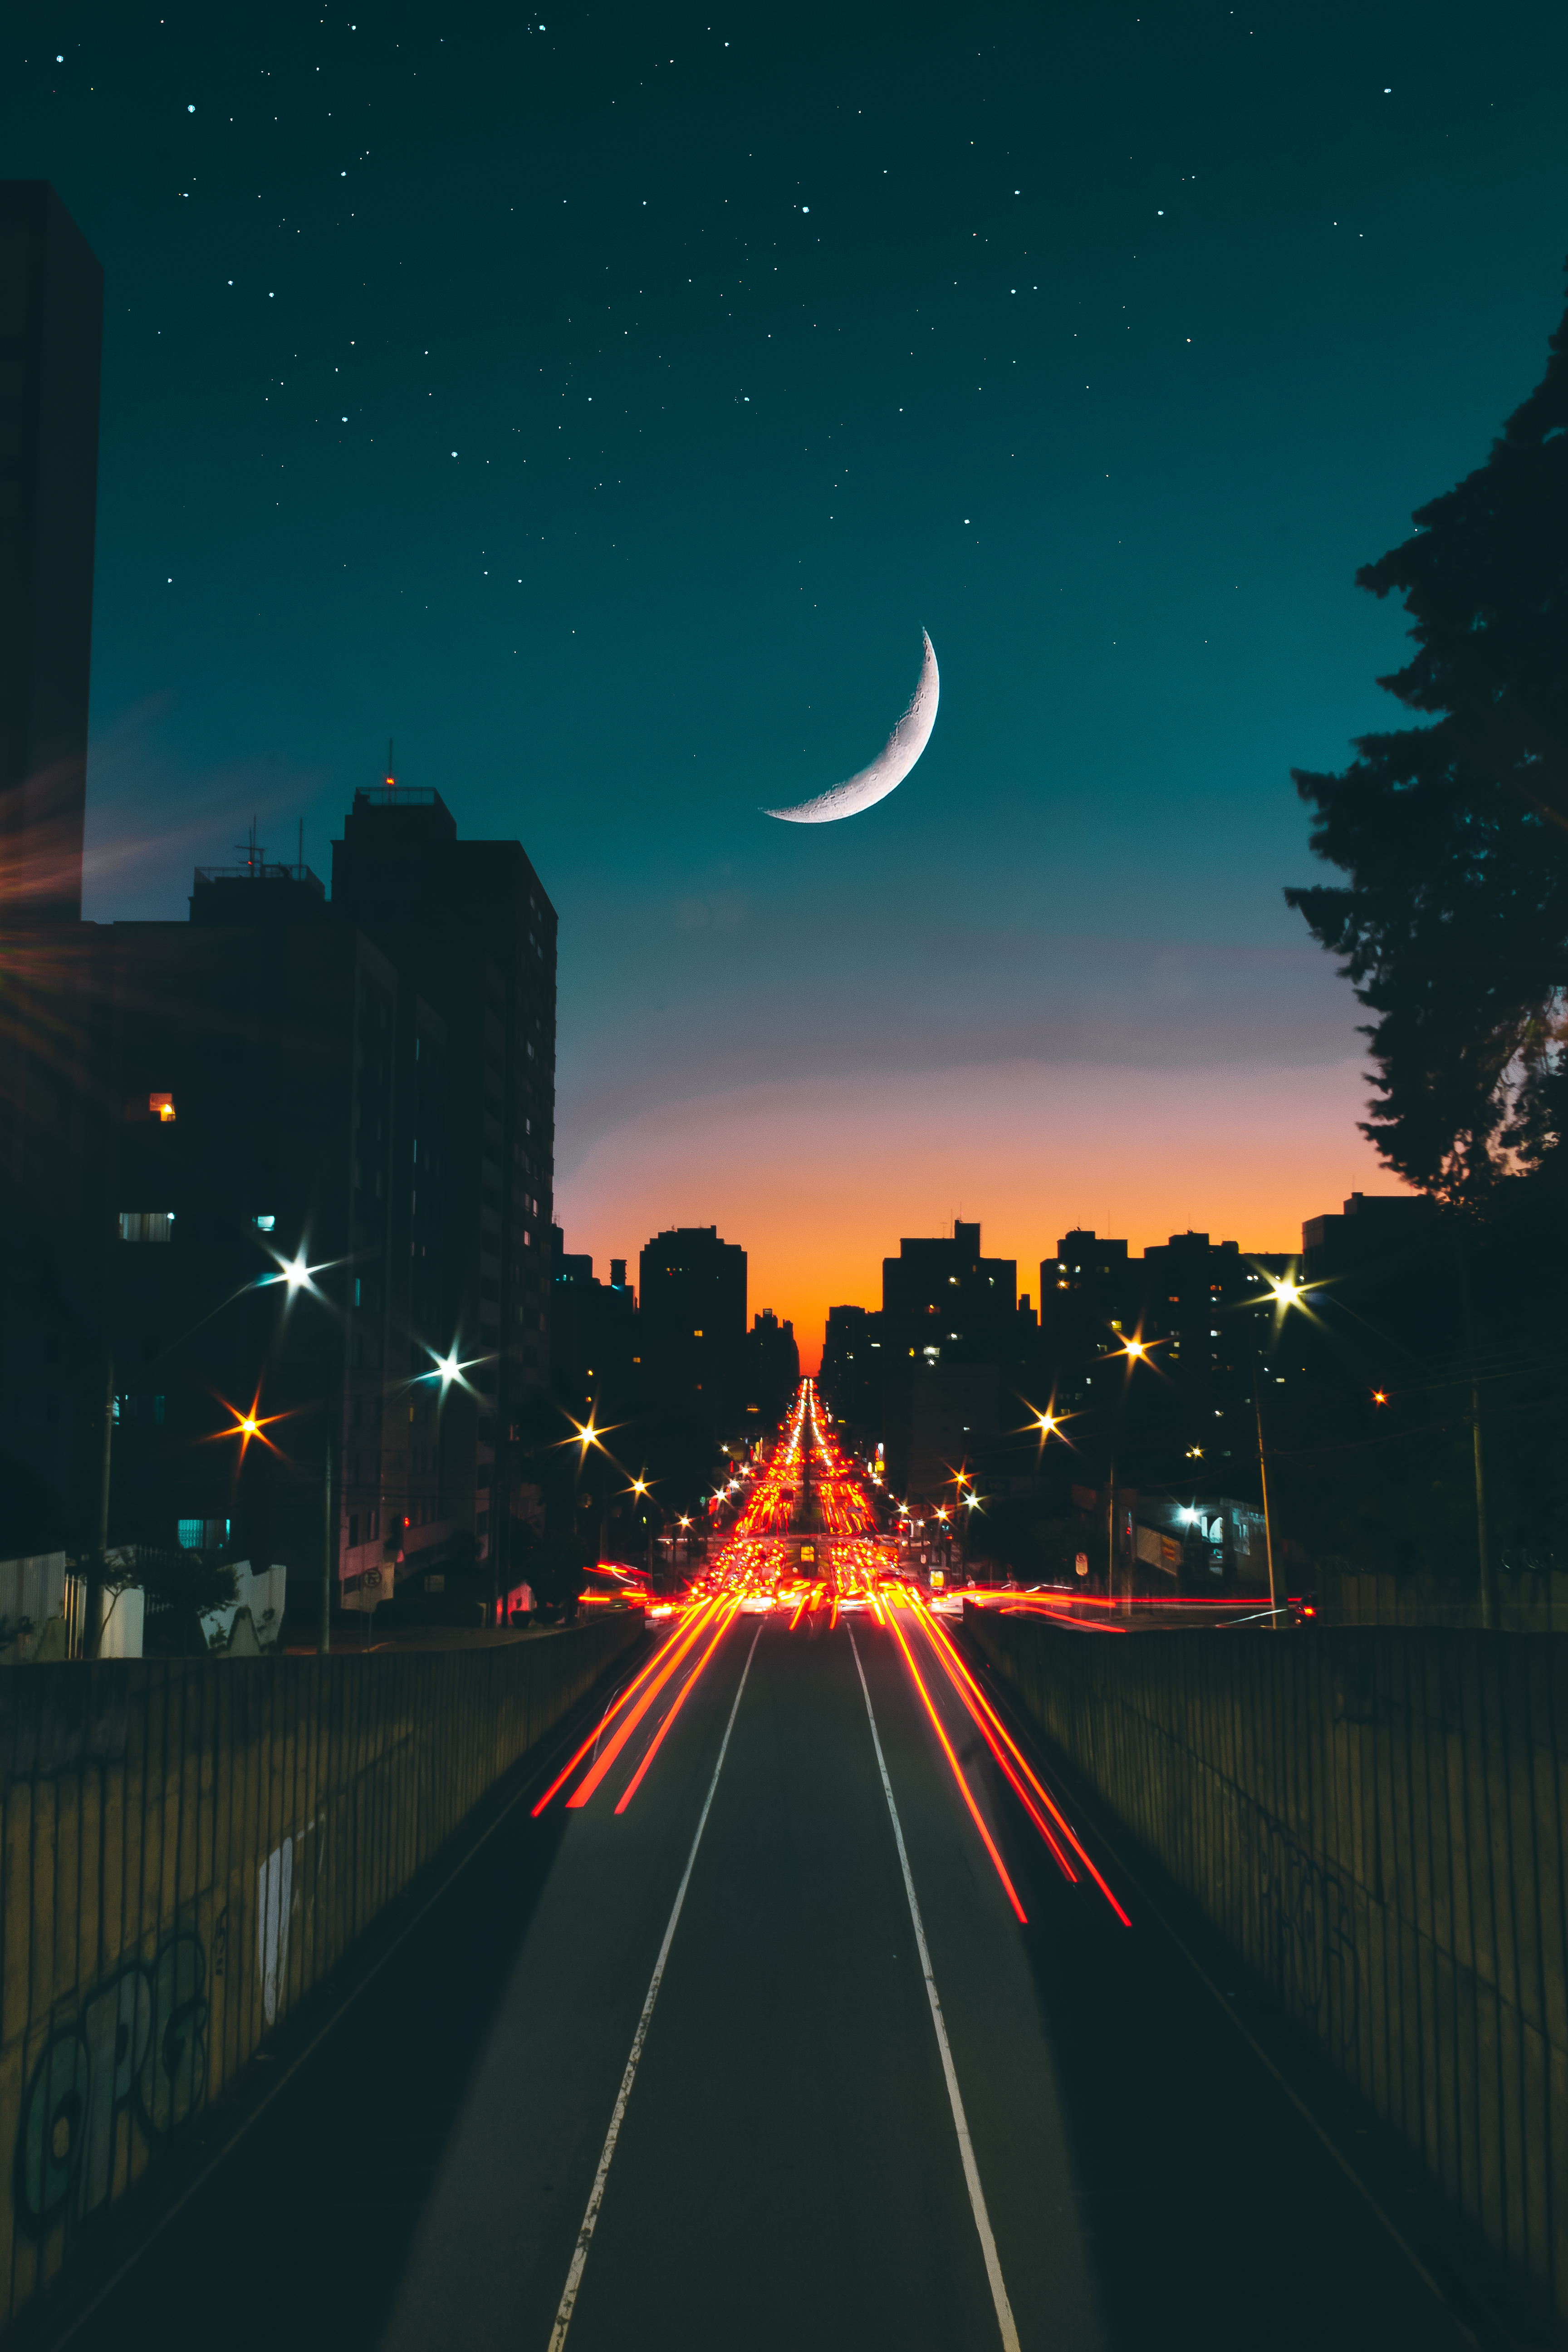 Night Sky over City Road